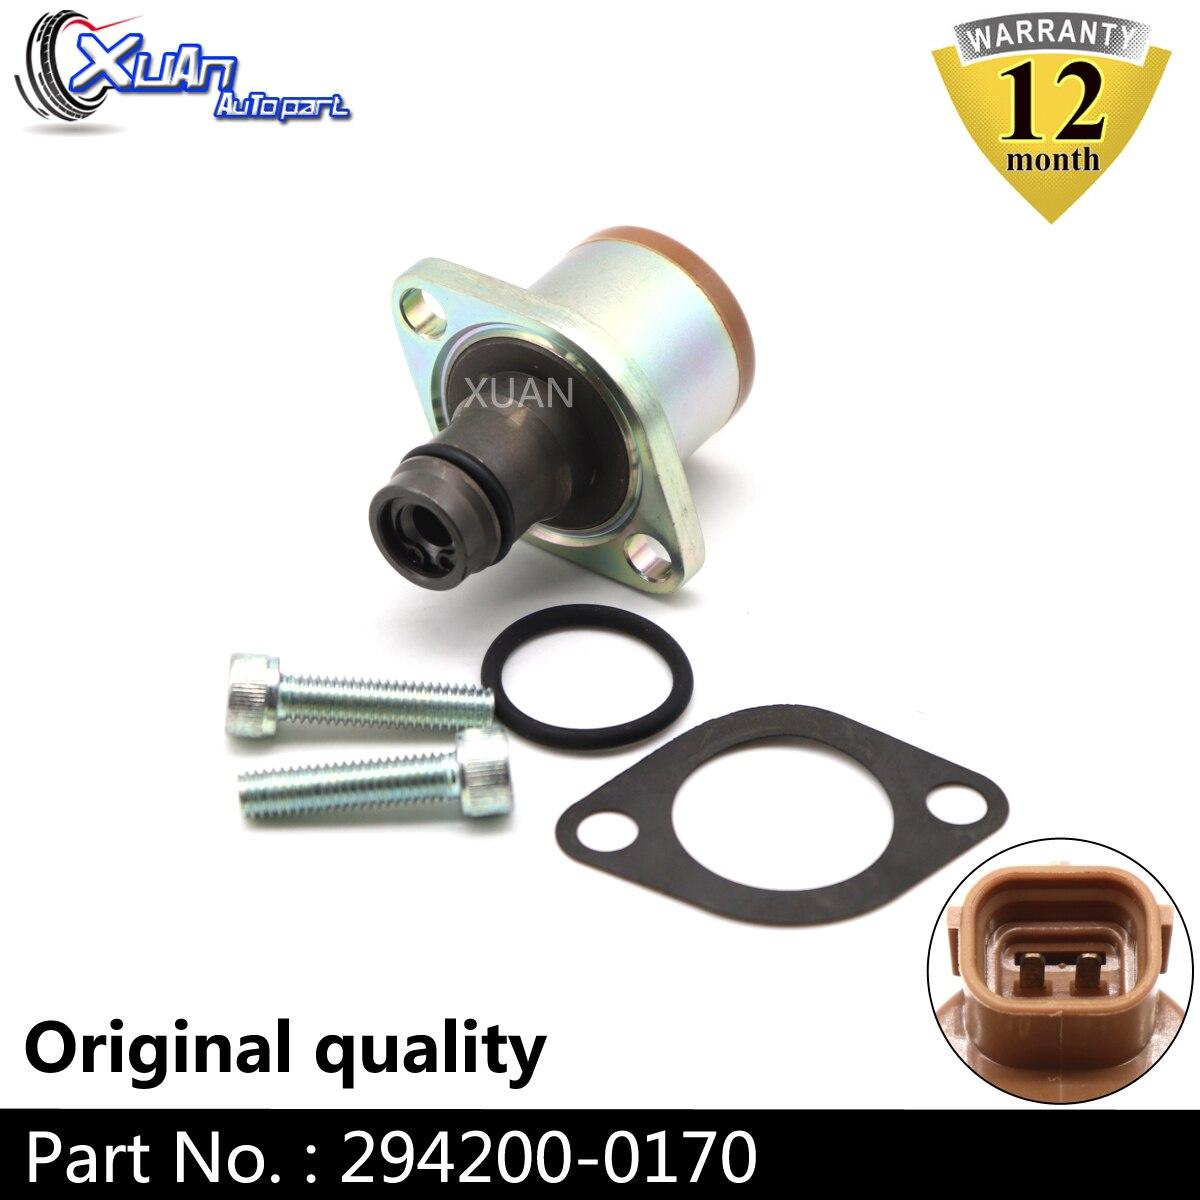 XUAN High Pressure Fuel Pump Regulator Suction Control SCV Valve 294200 0170 For Isuzu MITSUBISHI Nissan|Pressure Sensor| |  - title=